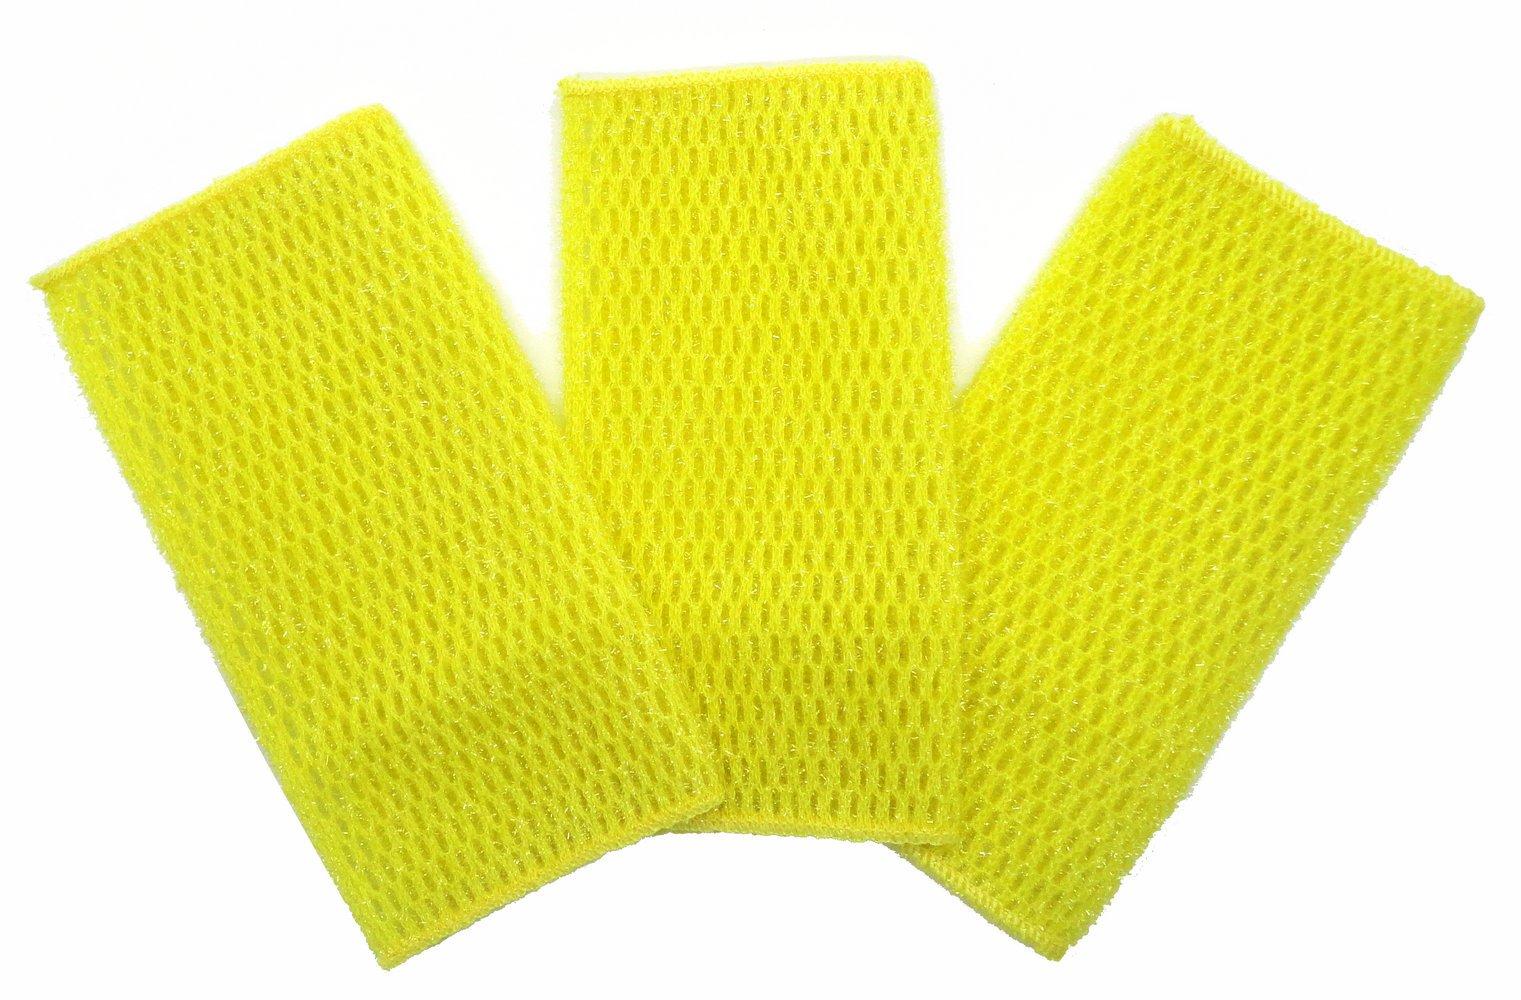 KLEIESH Dish Cloth for All Purpose Dish Washing 3 Pack (7''x9'', Yellow)